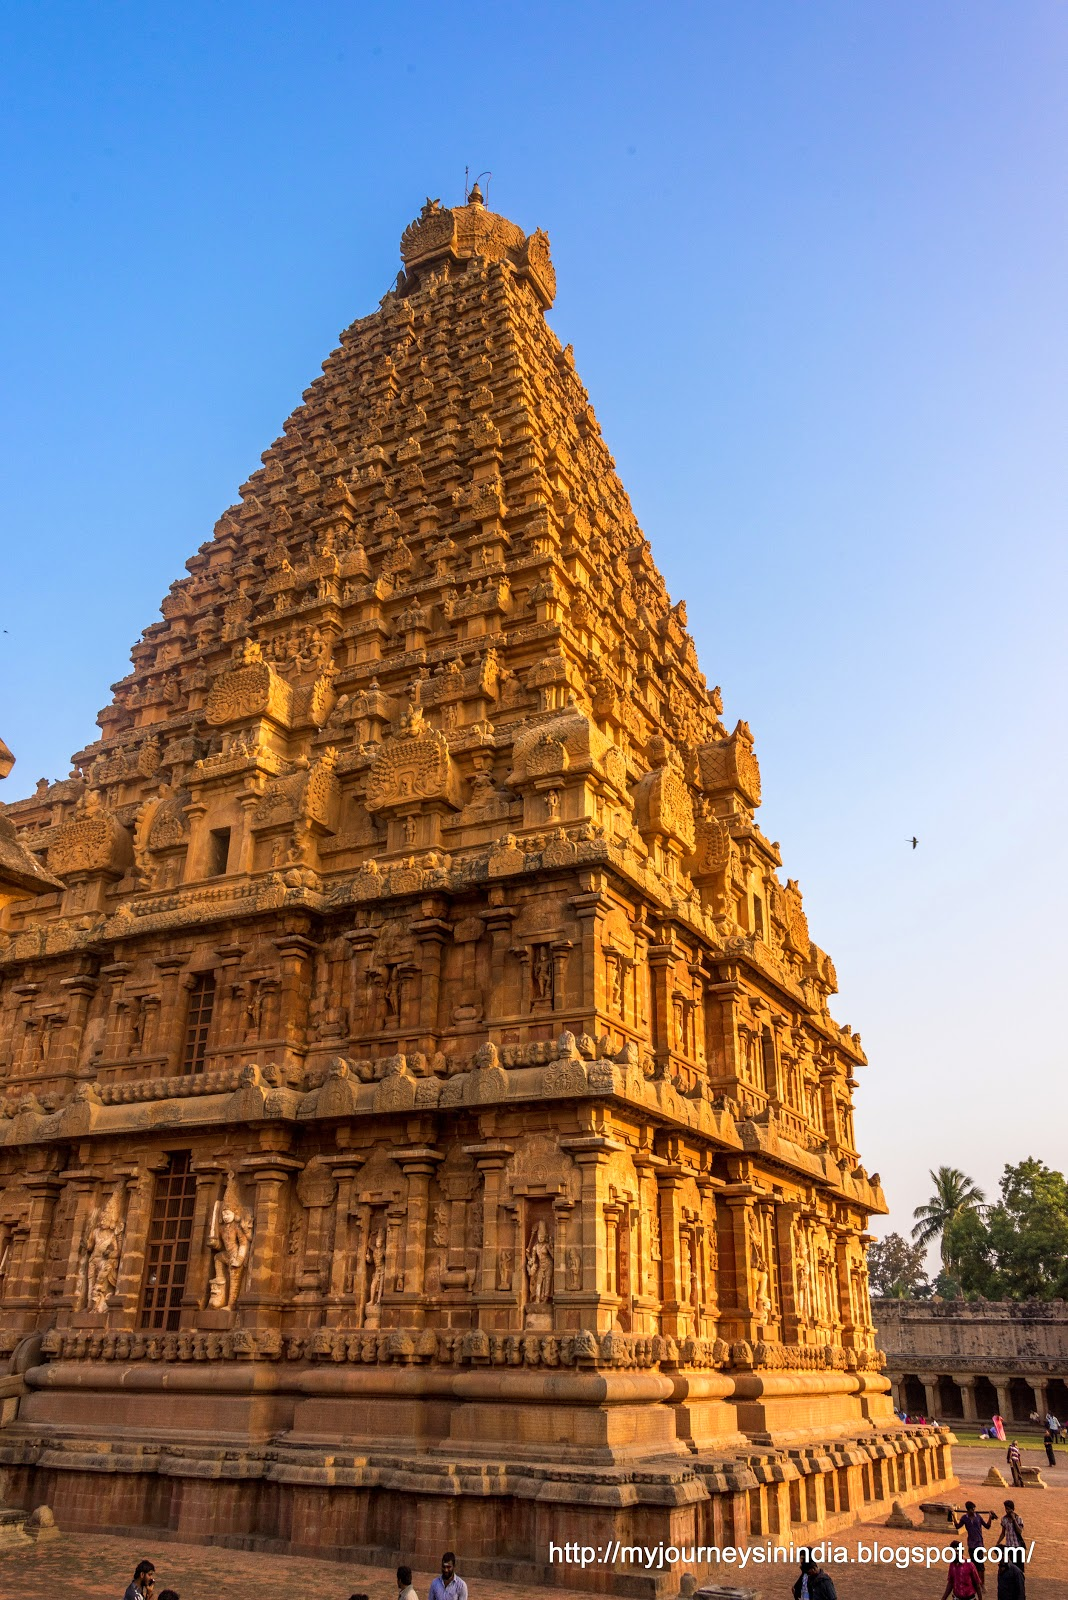 Thanjavur Brihadeeswarar Temple Tower Corner view